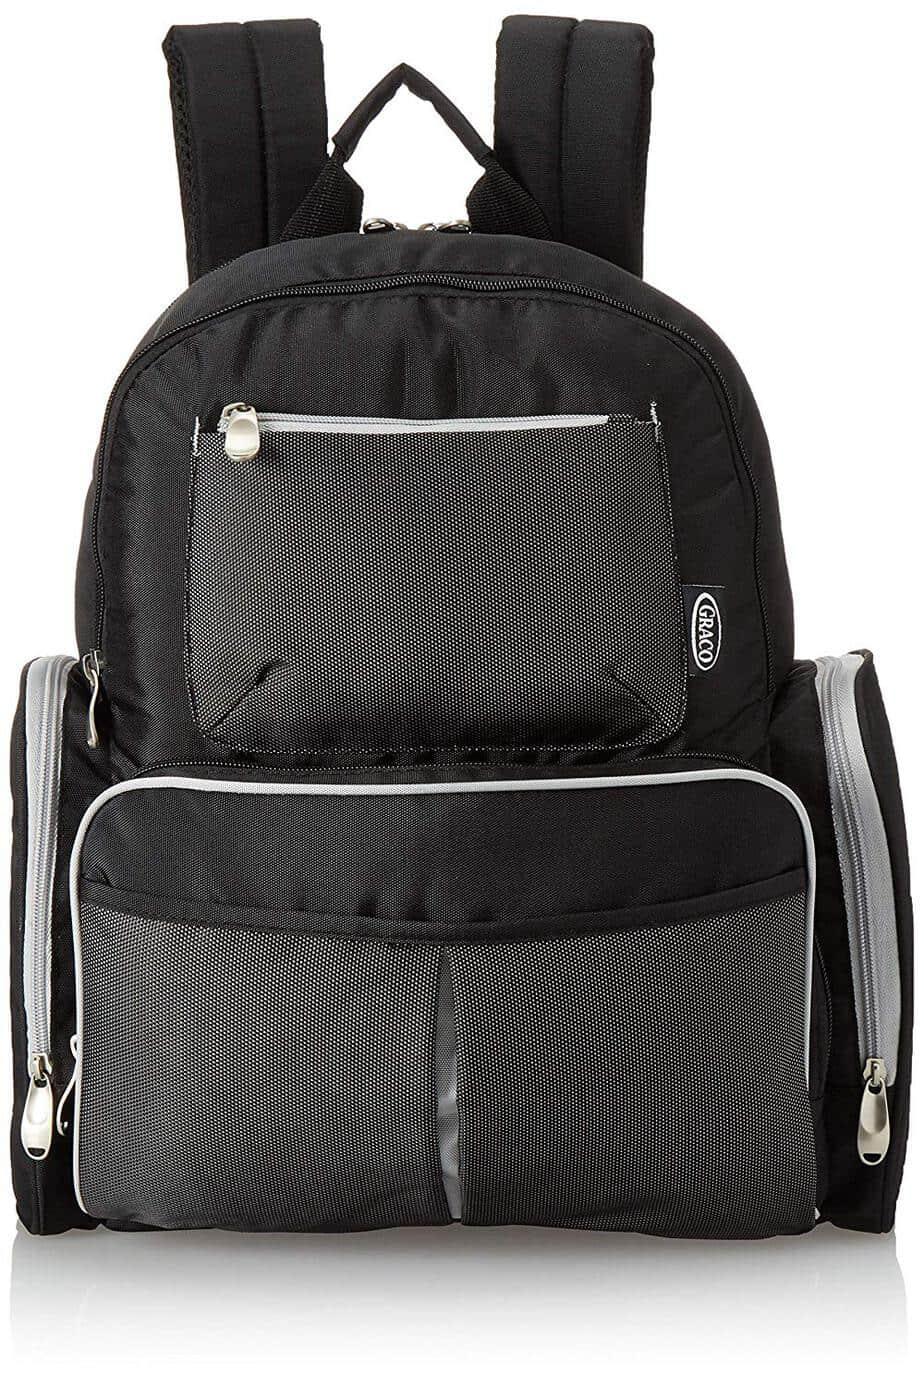 Graco Gotham Smart Organizer Baby Diaper Bag Backpack